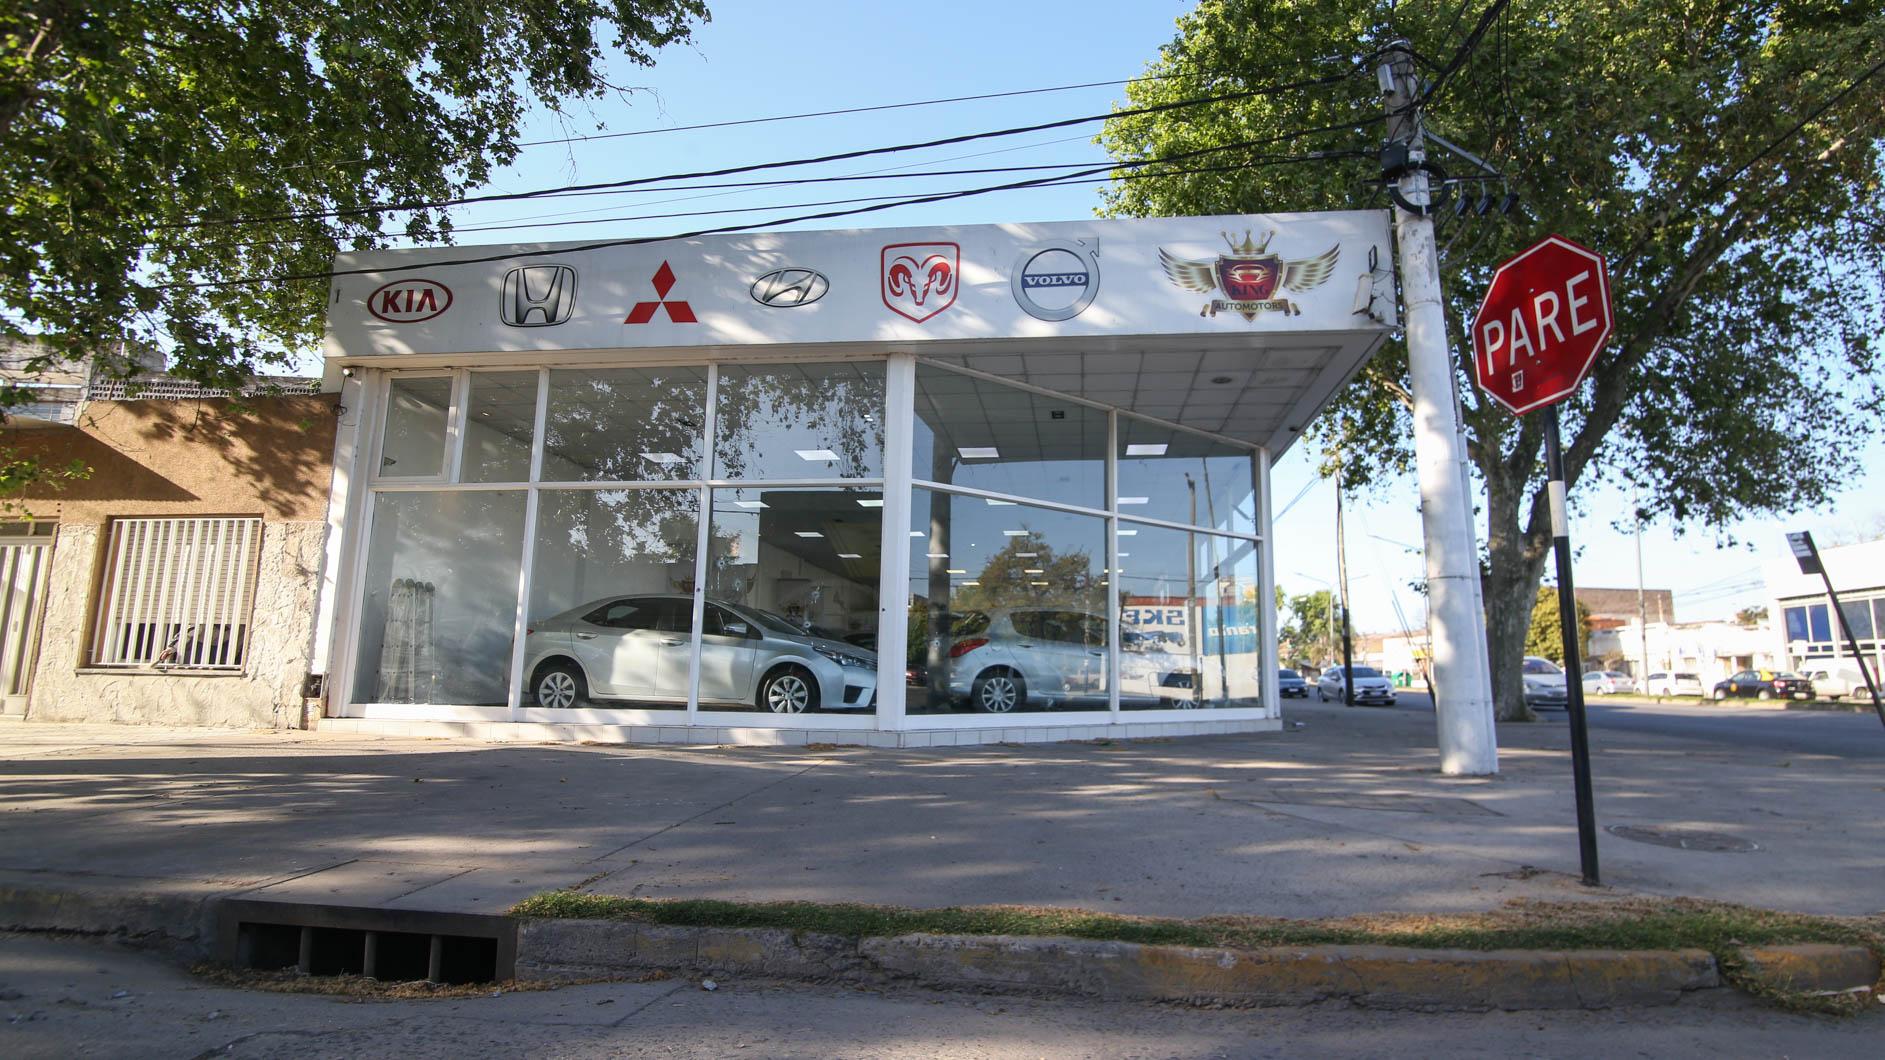 La agencia baleada. (Foto: Alan Monzón/Rosario3)